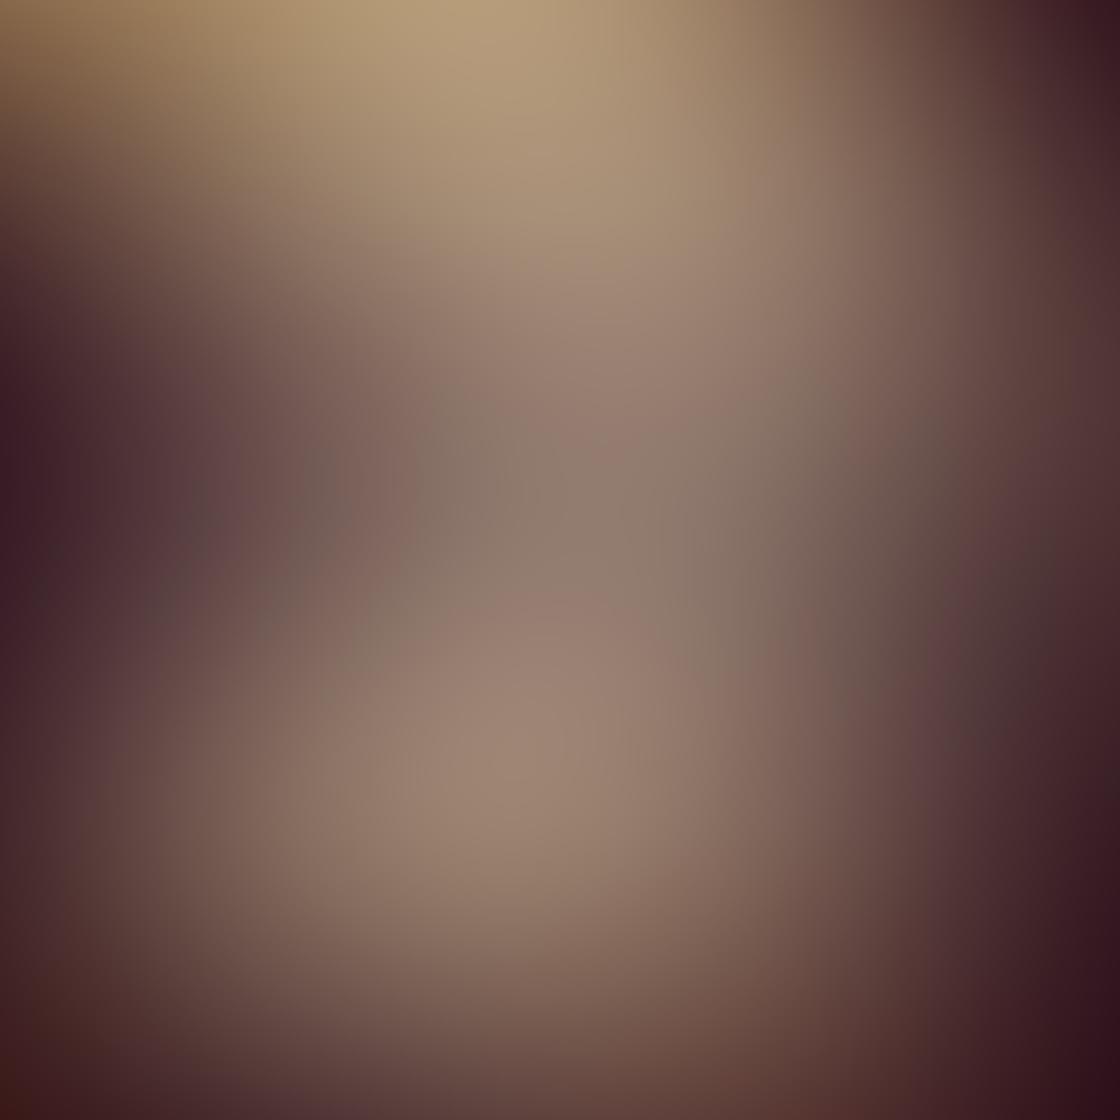 iPhone Weather Photo 11